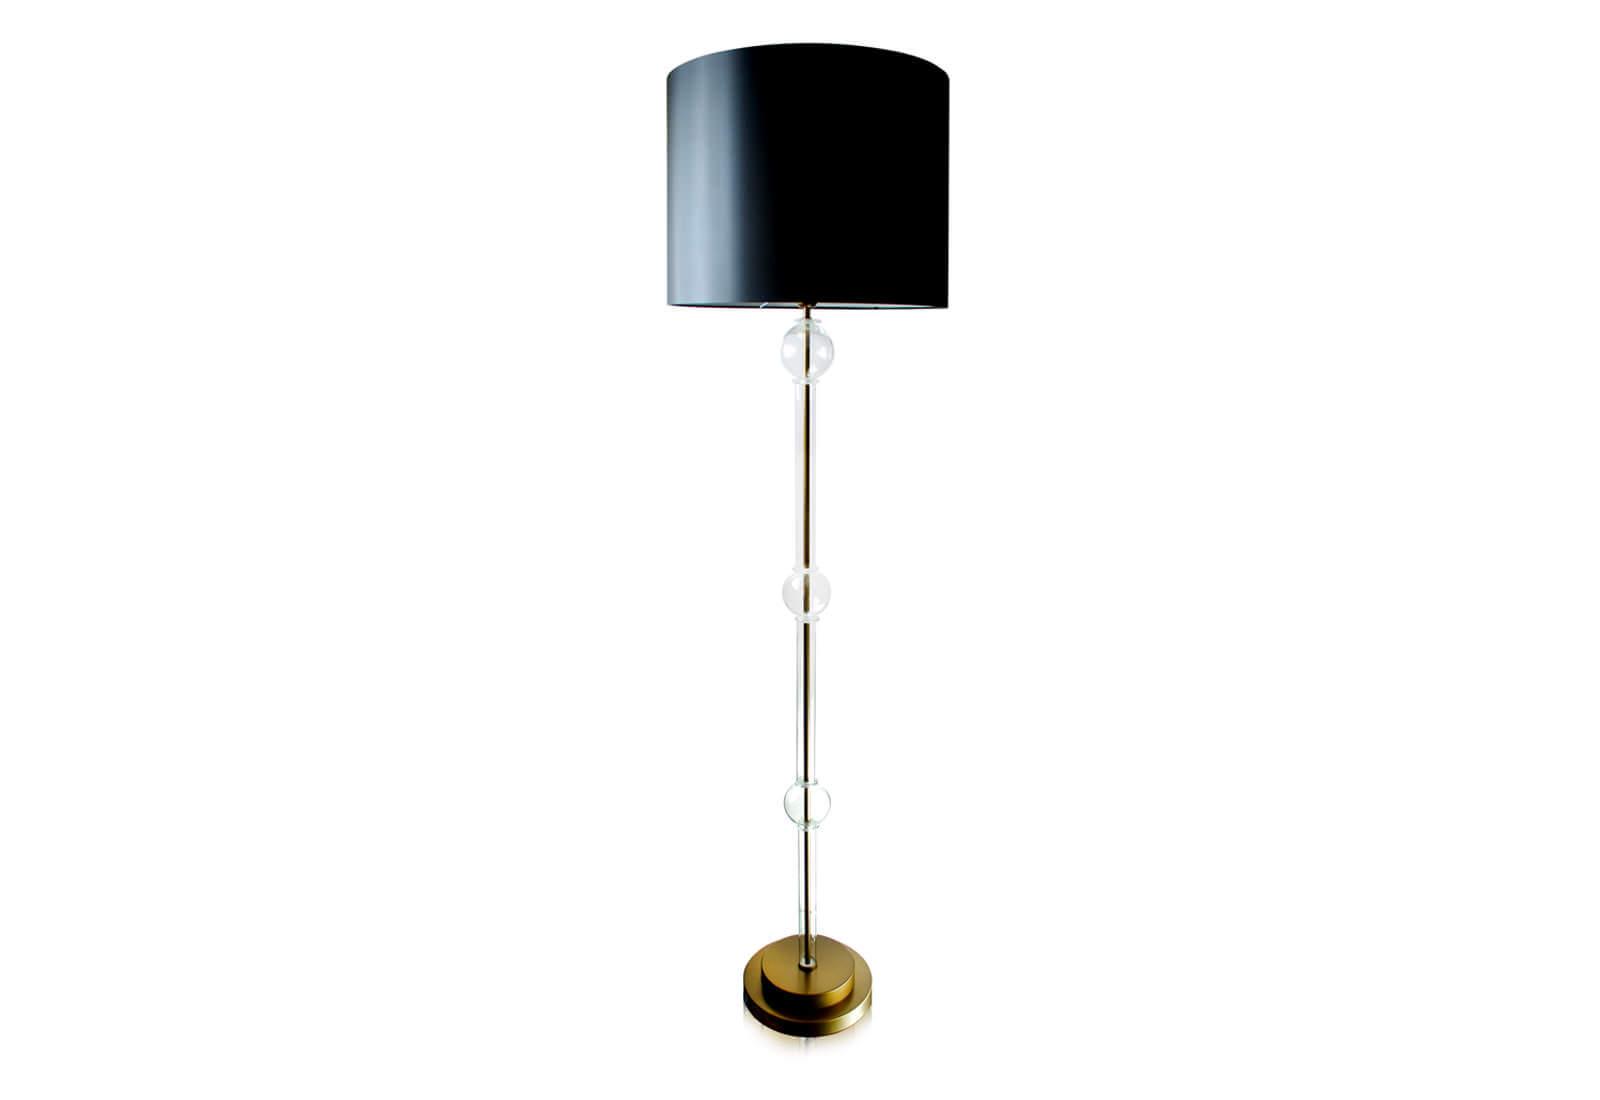 Lloyd villaverde london villaverde london lloyd murano floor lamp 2 mozeypictures Images